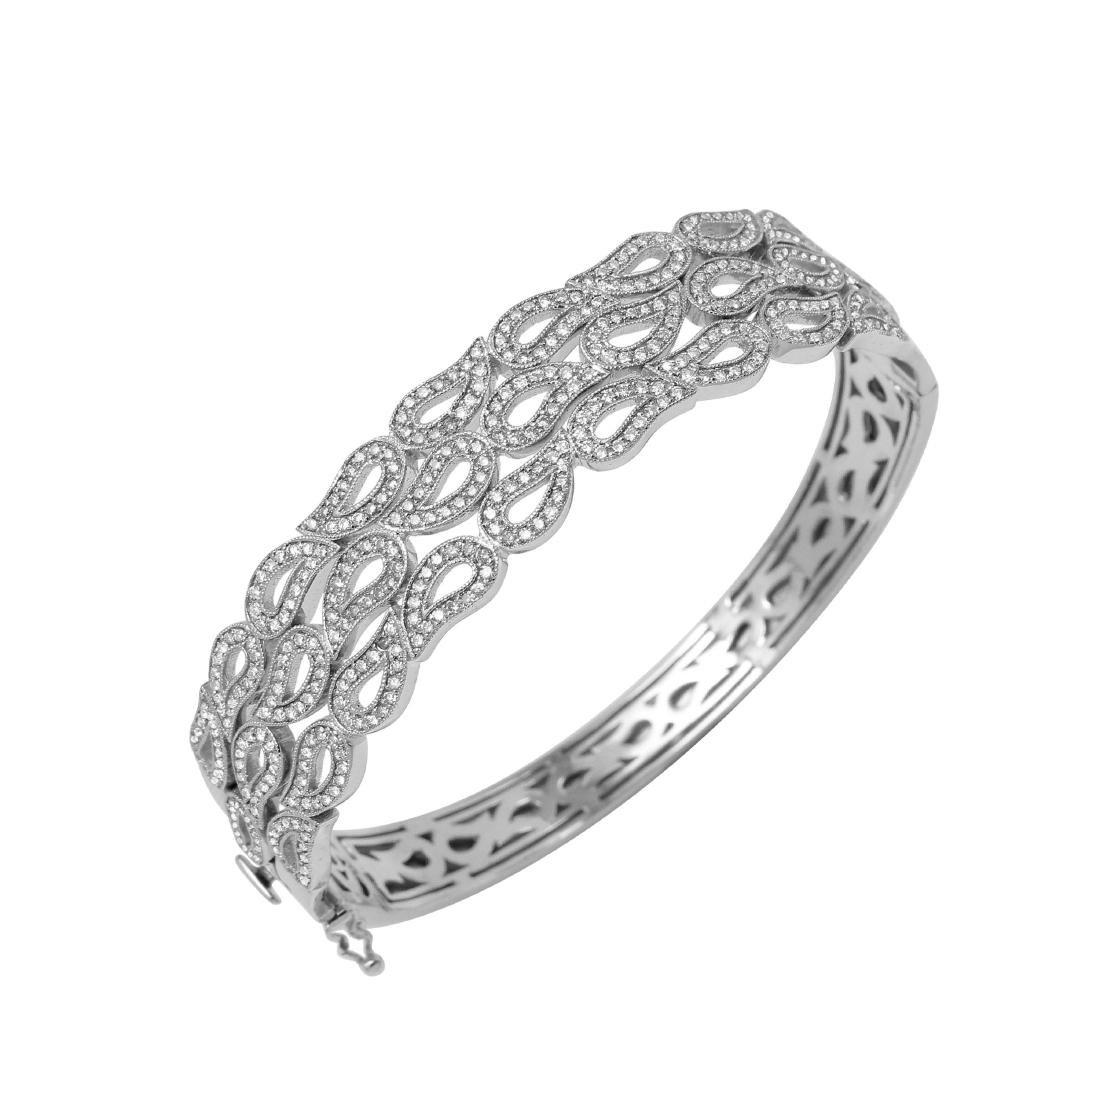 14KT White Gold Diamond Bangle Bracelet - 2